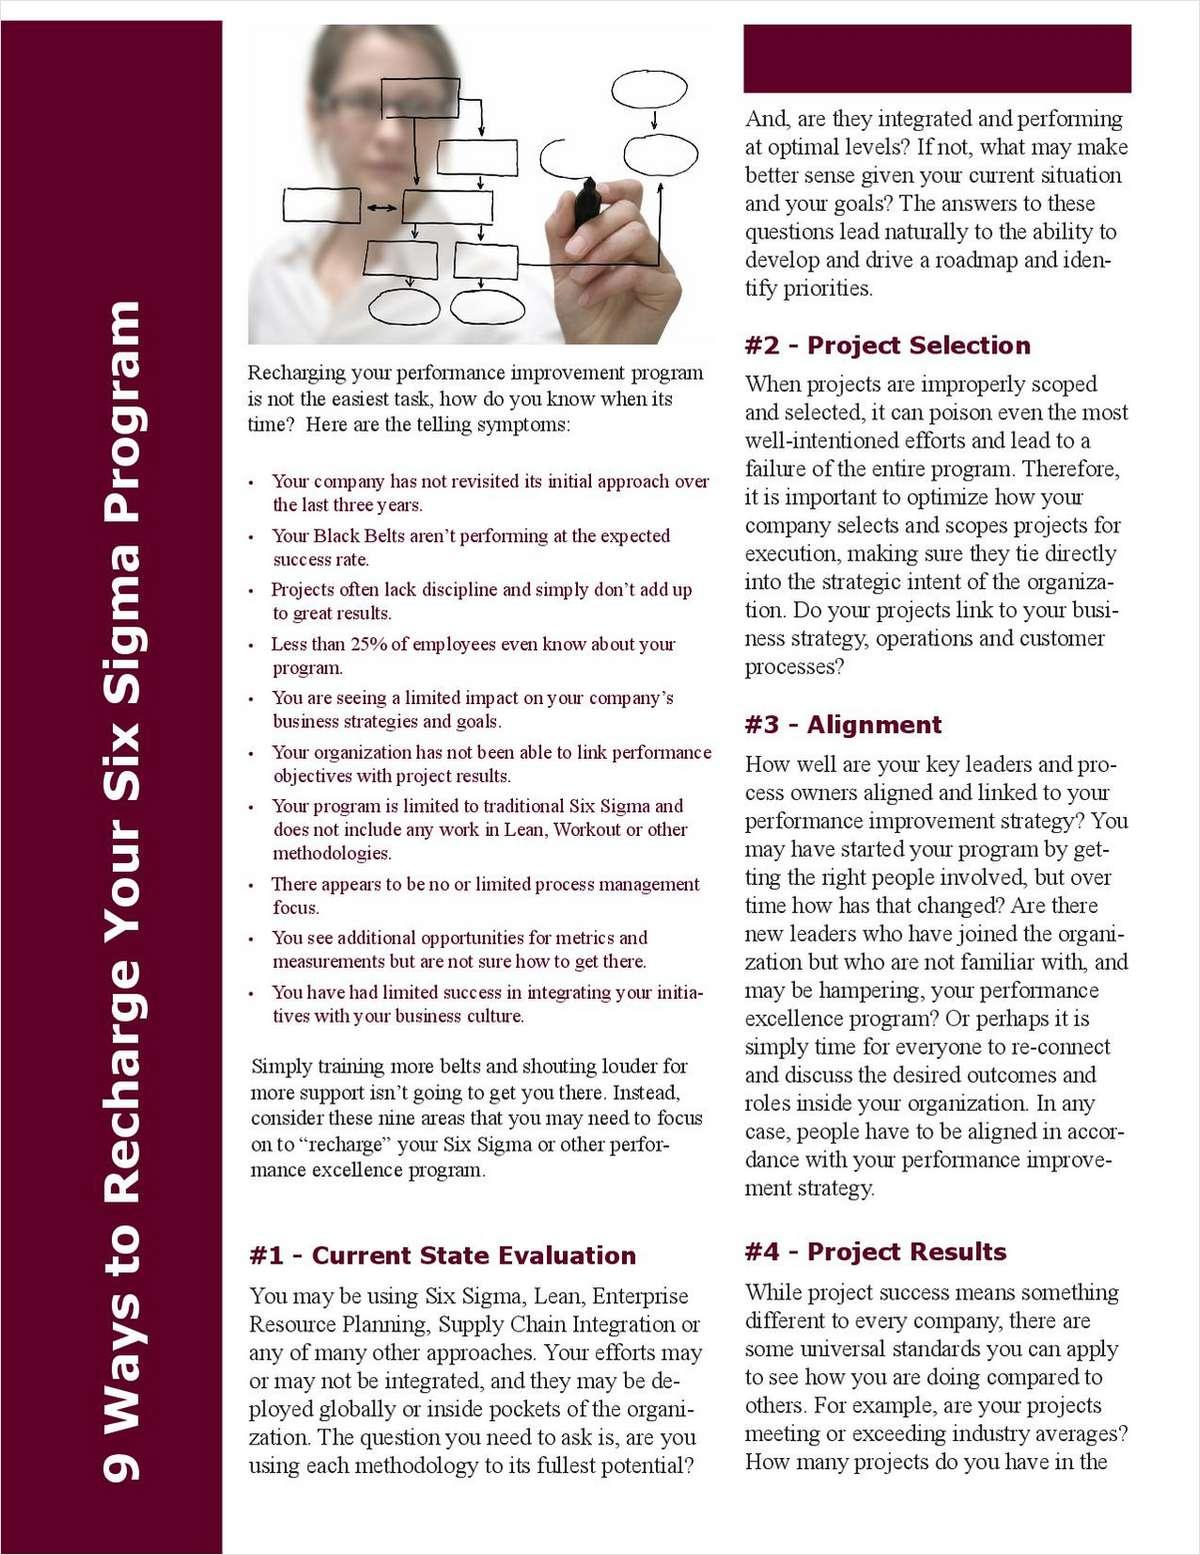 9 Ways to Recharge Your Six Sigma Program